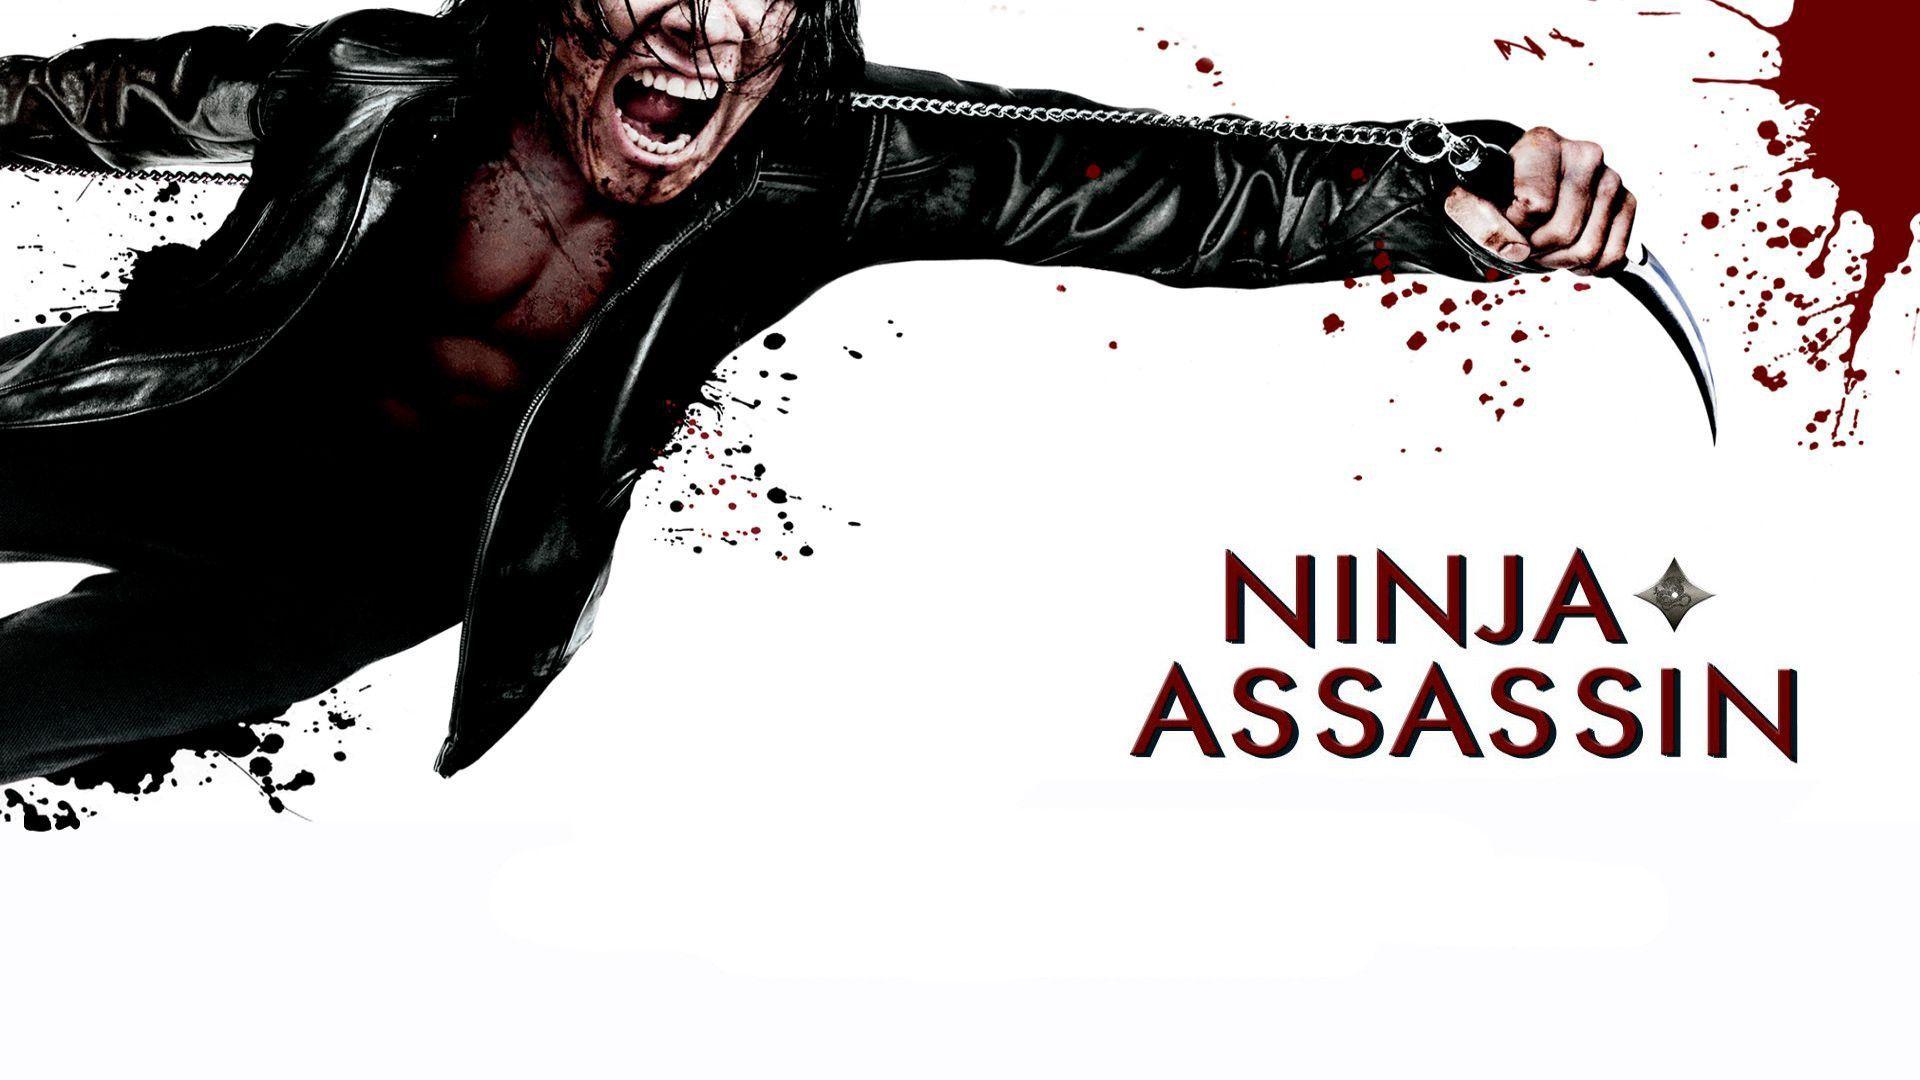 Amazing Ninja Assassin Pictures & Backgrounds